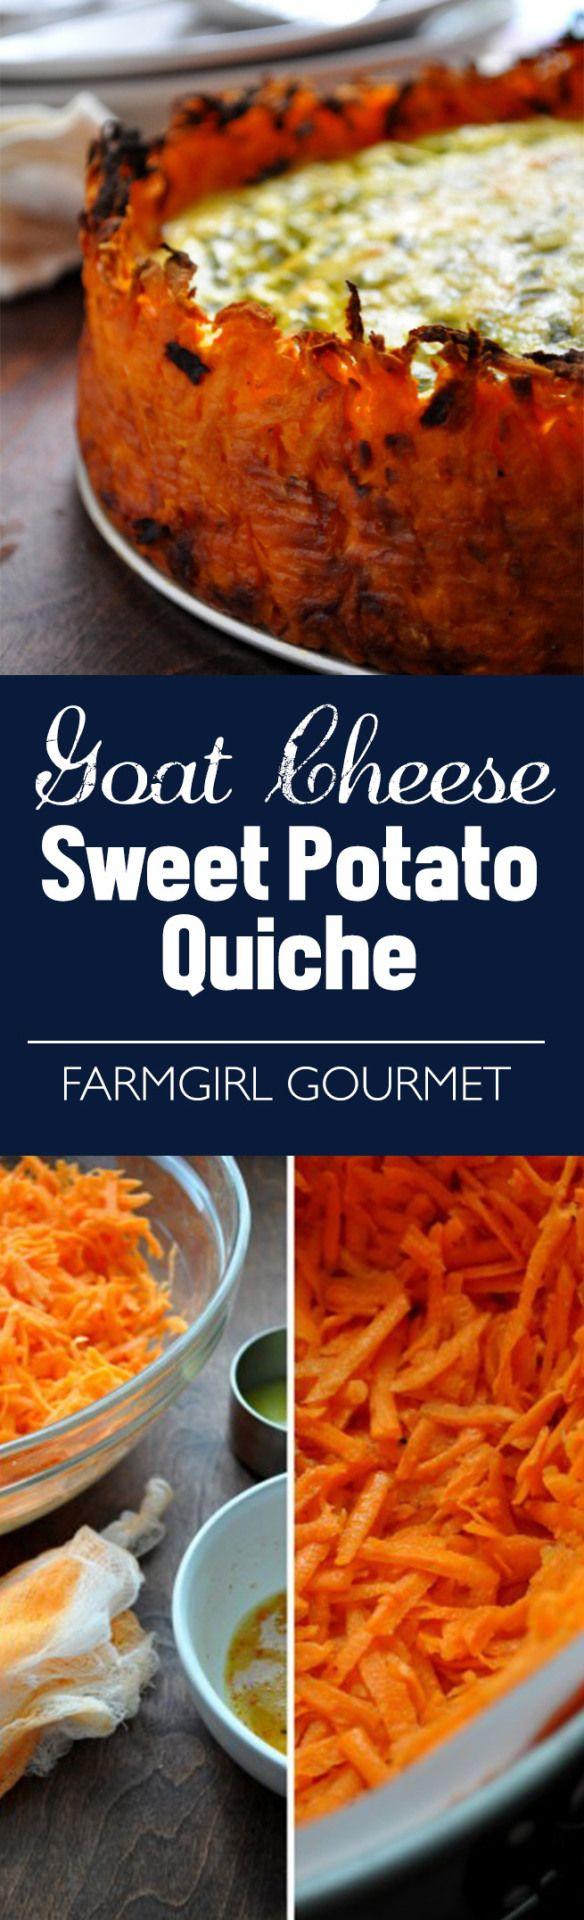 Goat Cheese Quiche with Sweet Potato Crust | farmgirlgourmet.com